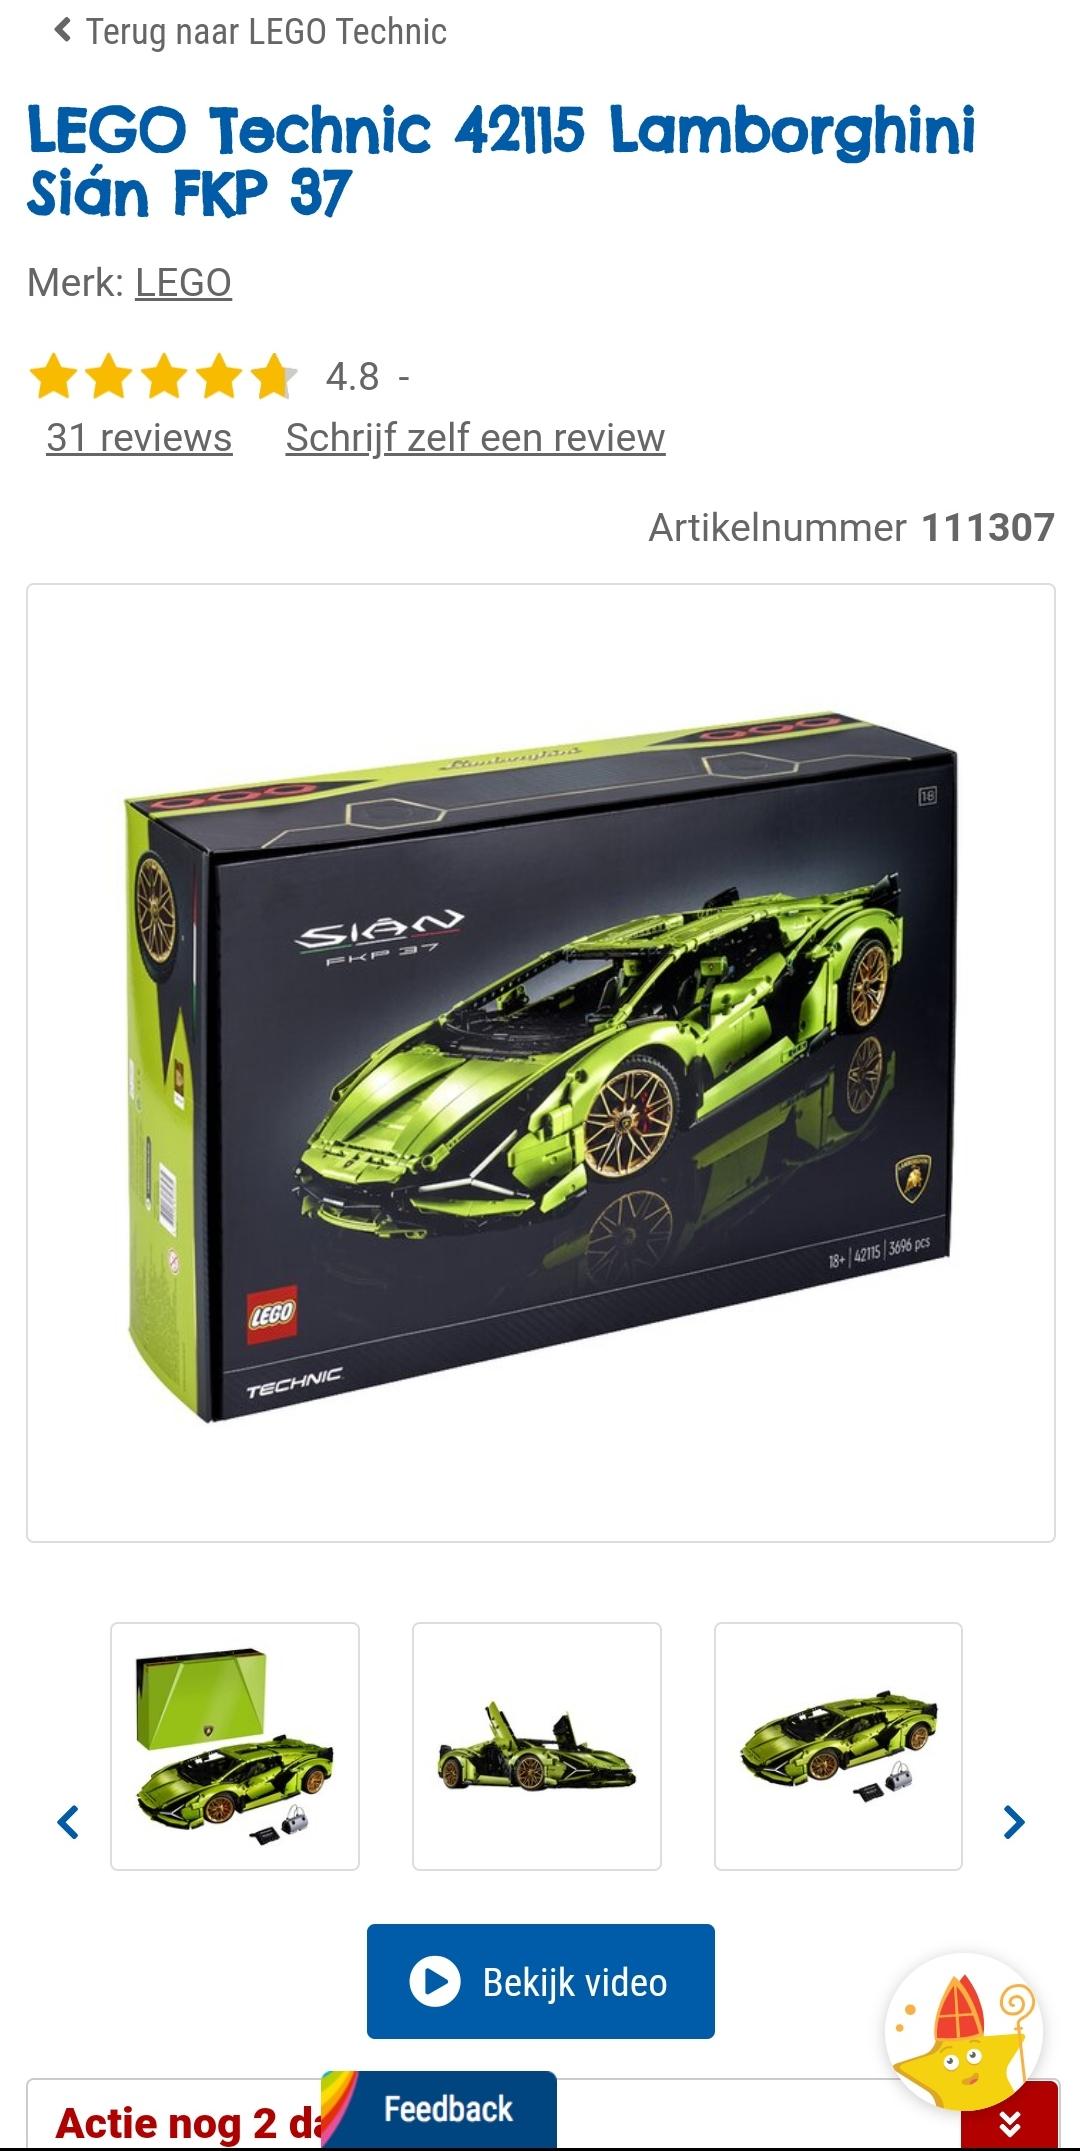 LEGO Technic 42115 Lamborghini Sián FKP 37 - laagste prijs